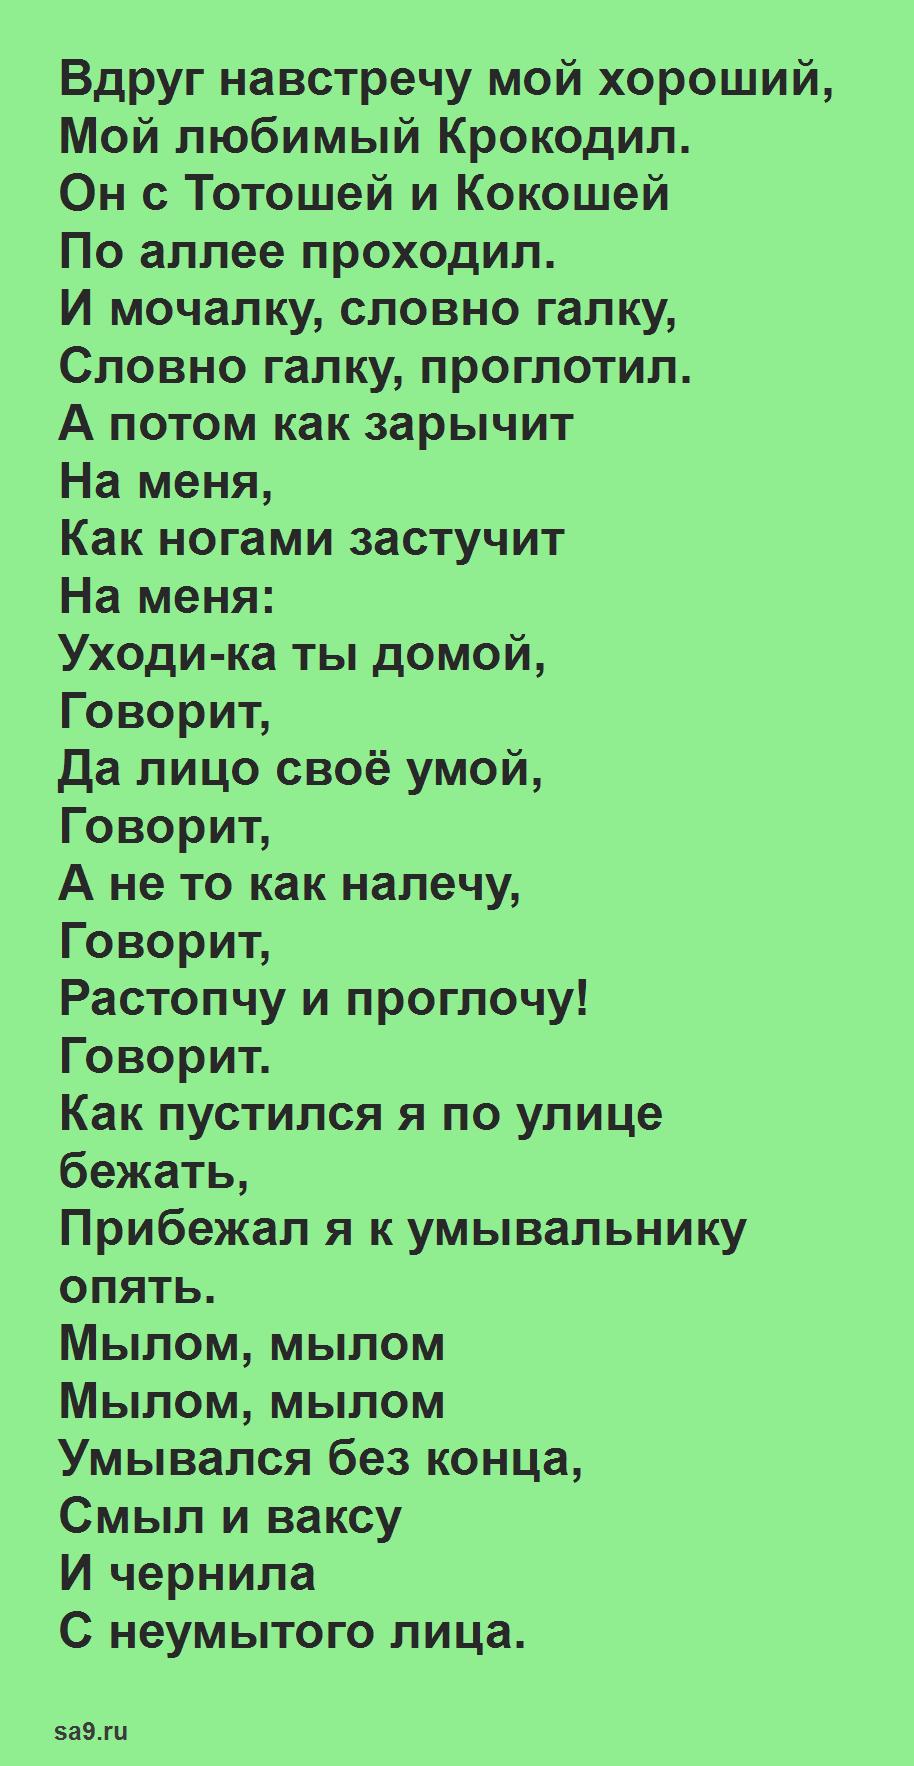 Сказка 'Мойдодыр', онлайн бесплатно